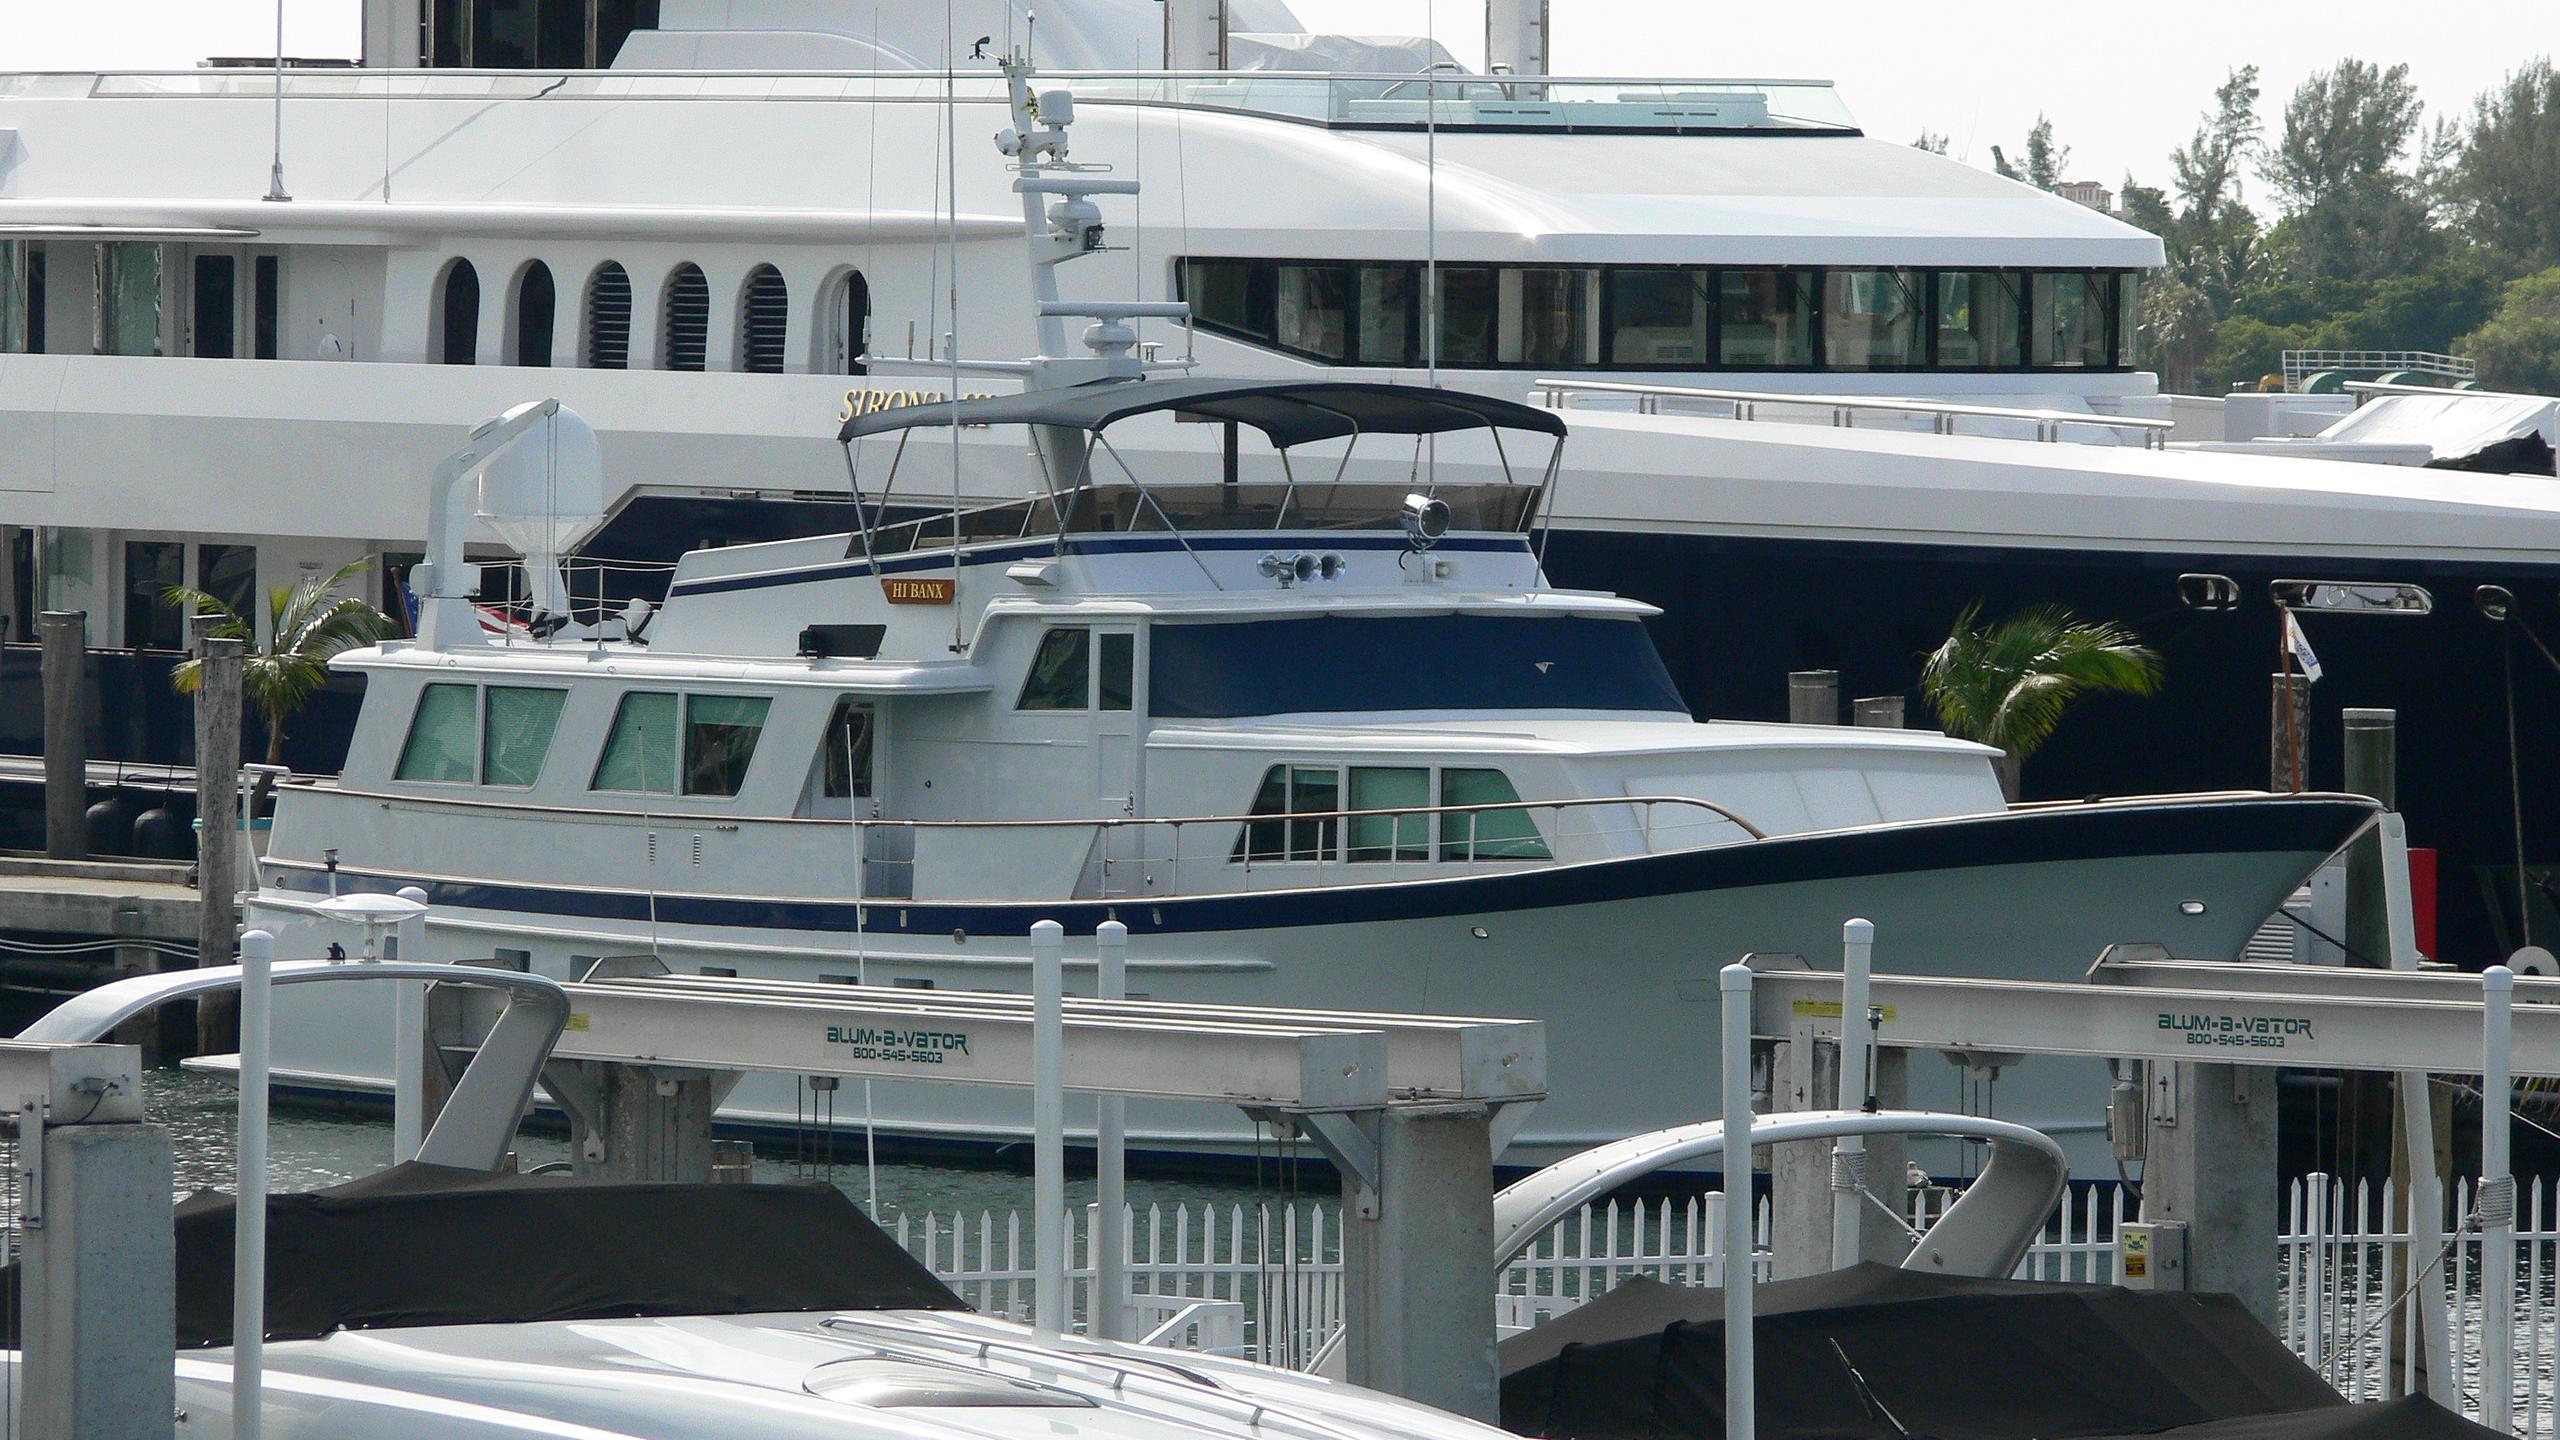 hi-banx-motor-yacht-burger-boats-1979-26m-half-profile